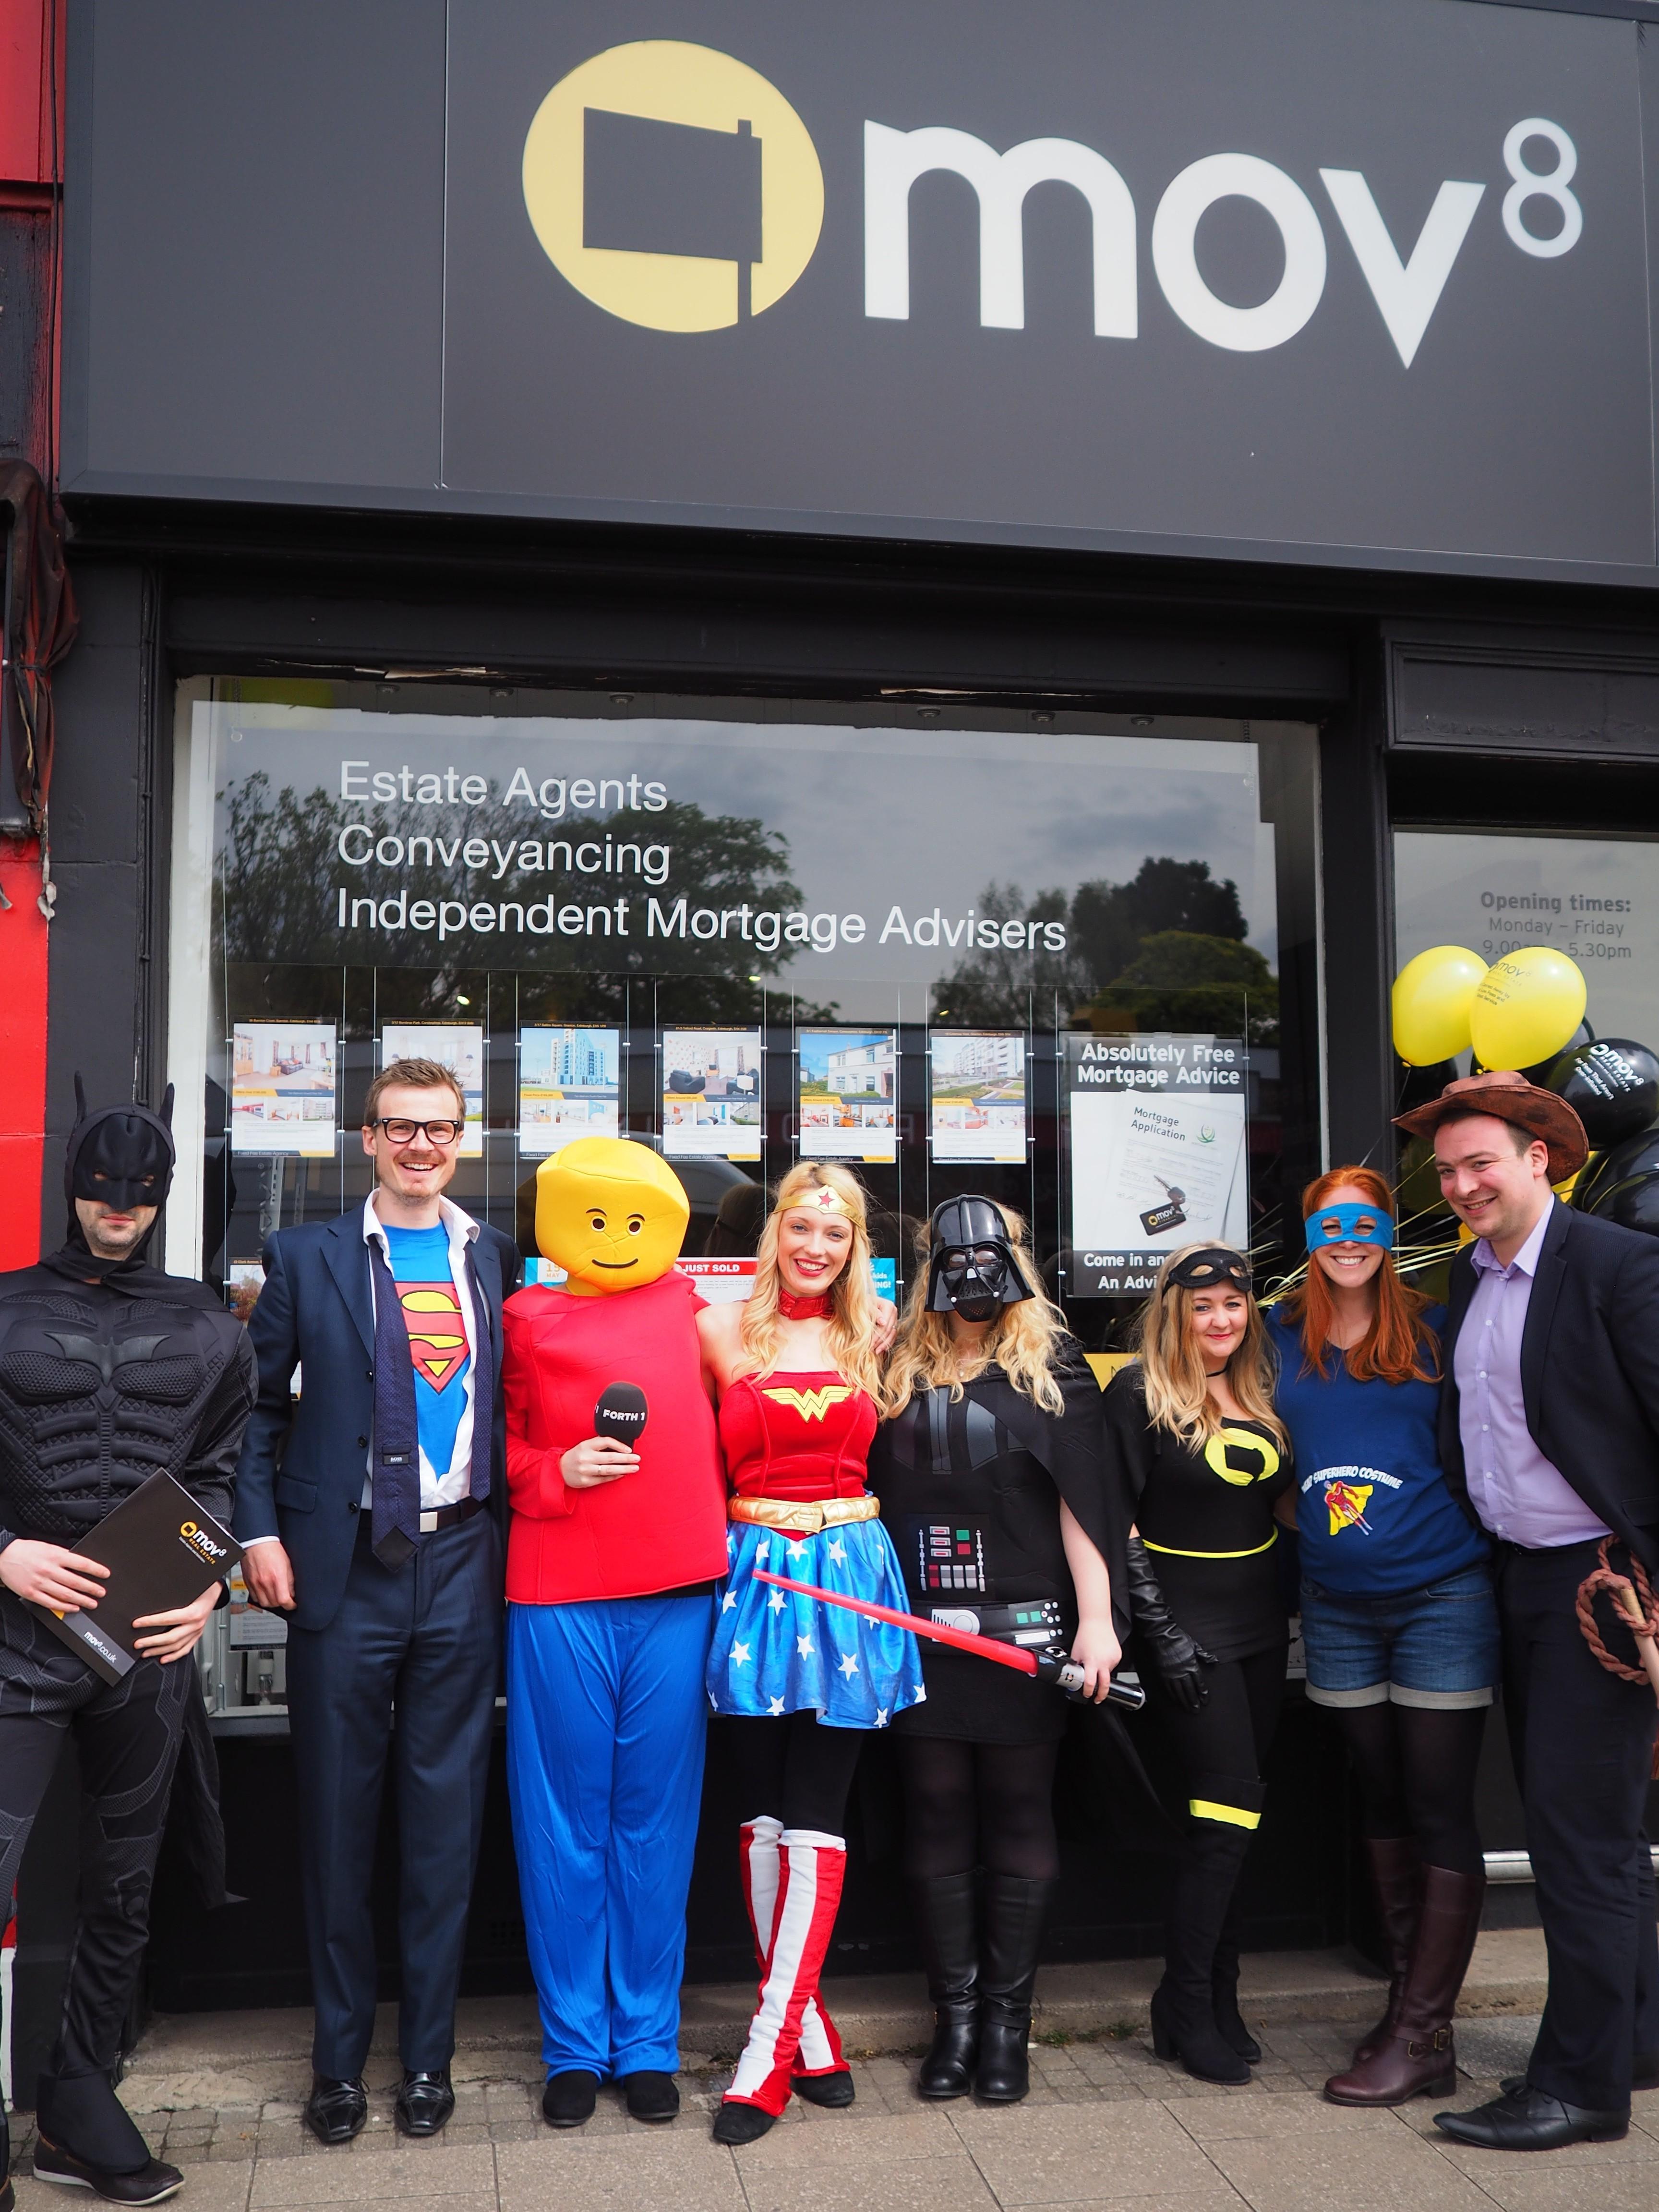 Cash for kids superhero day!